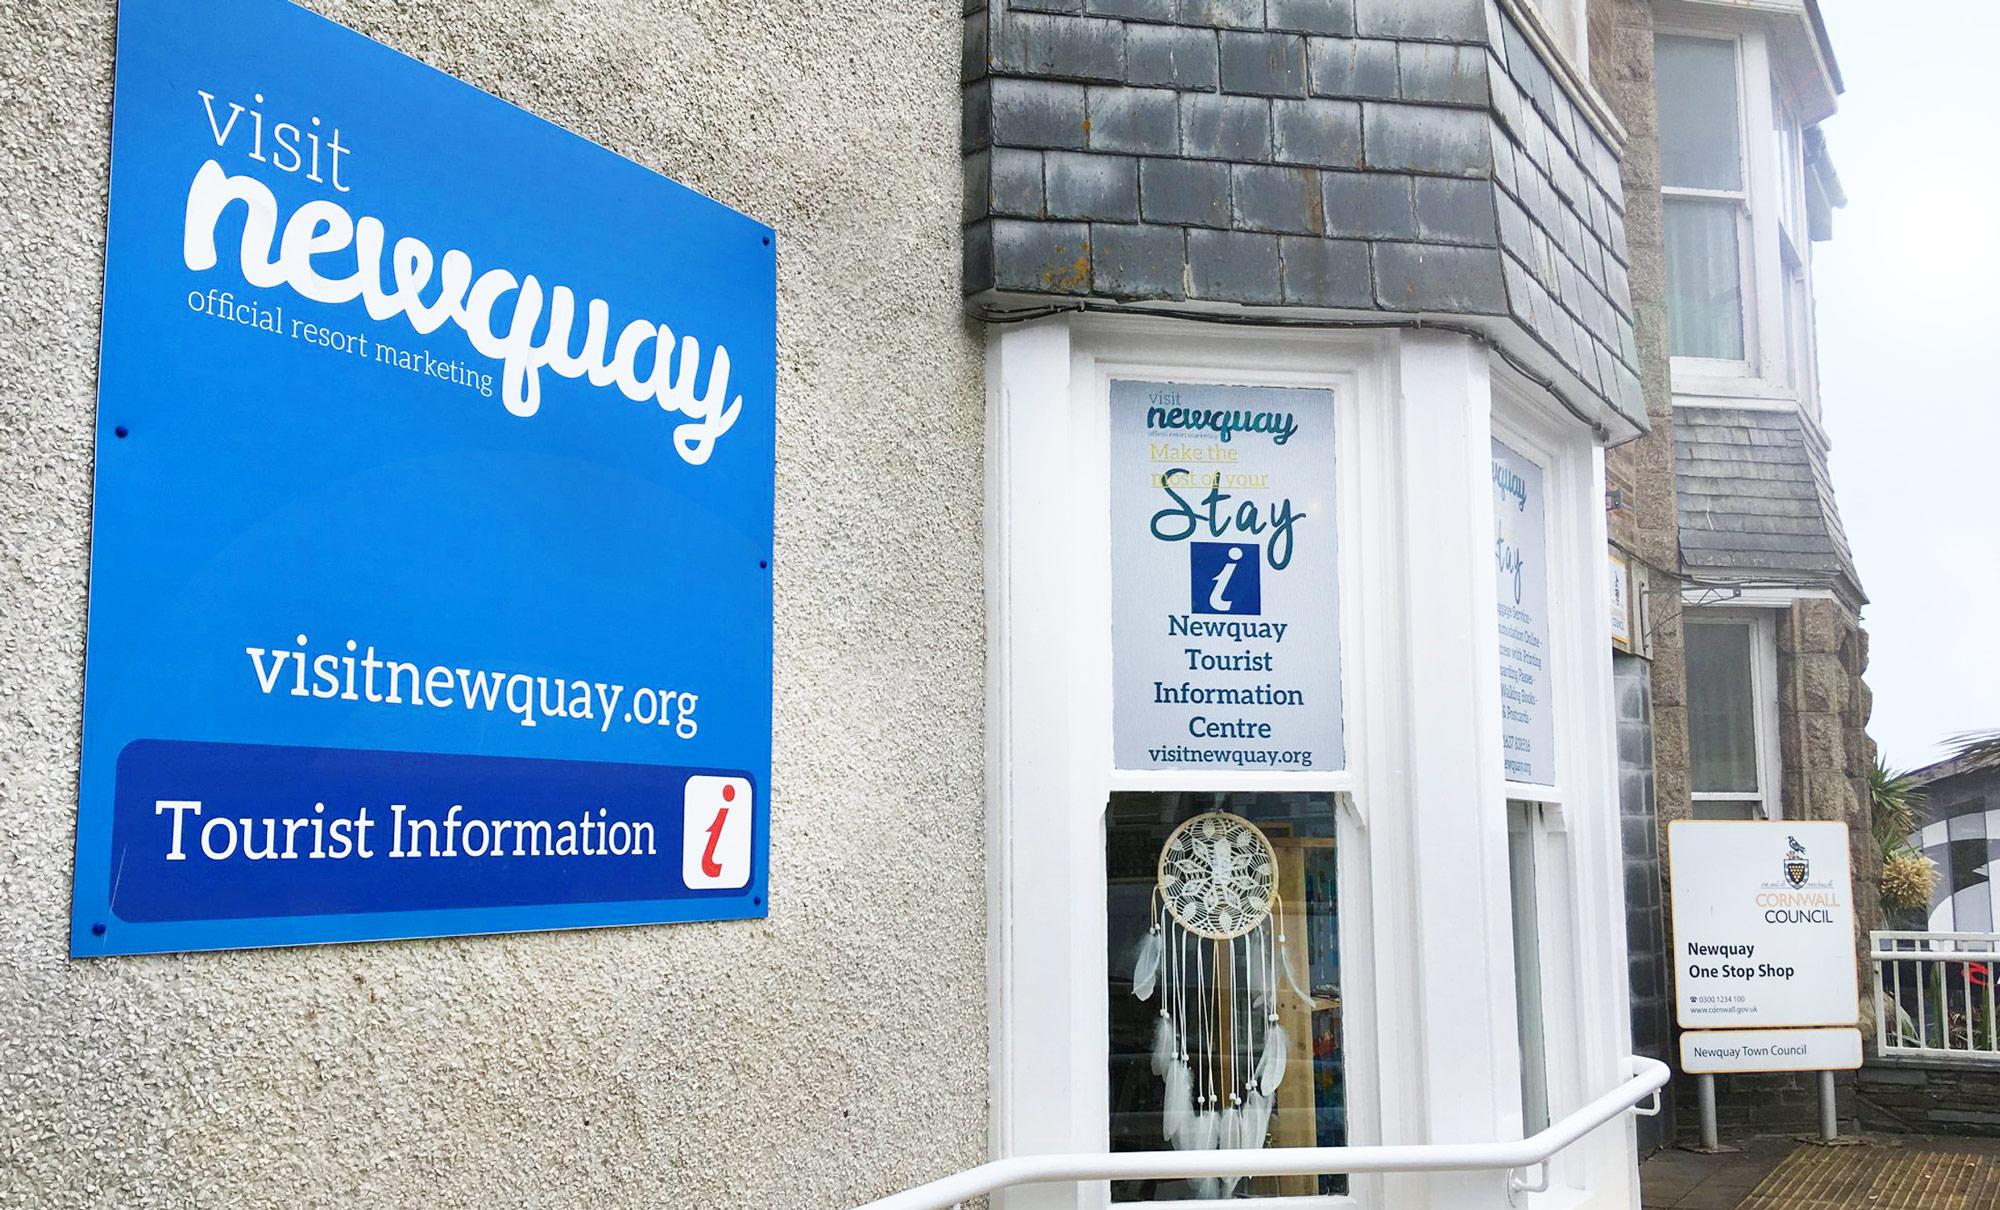 Newquay TIC